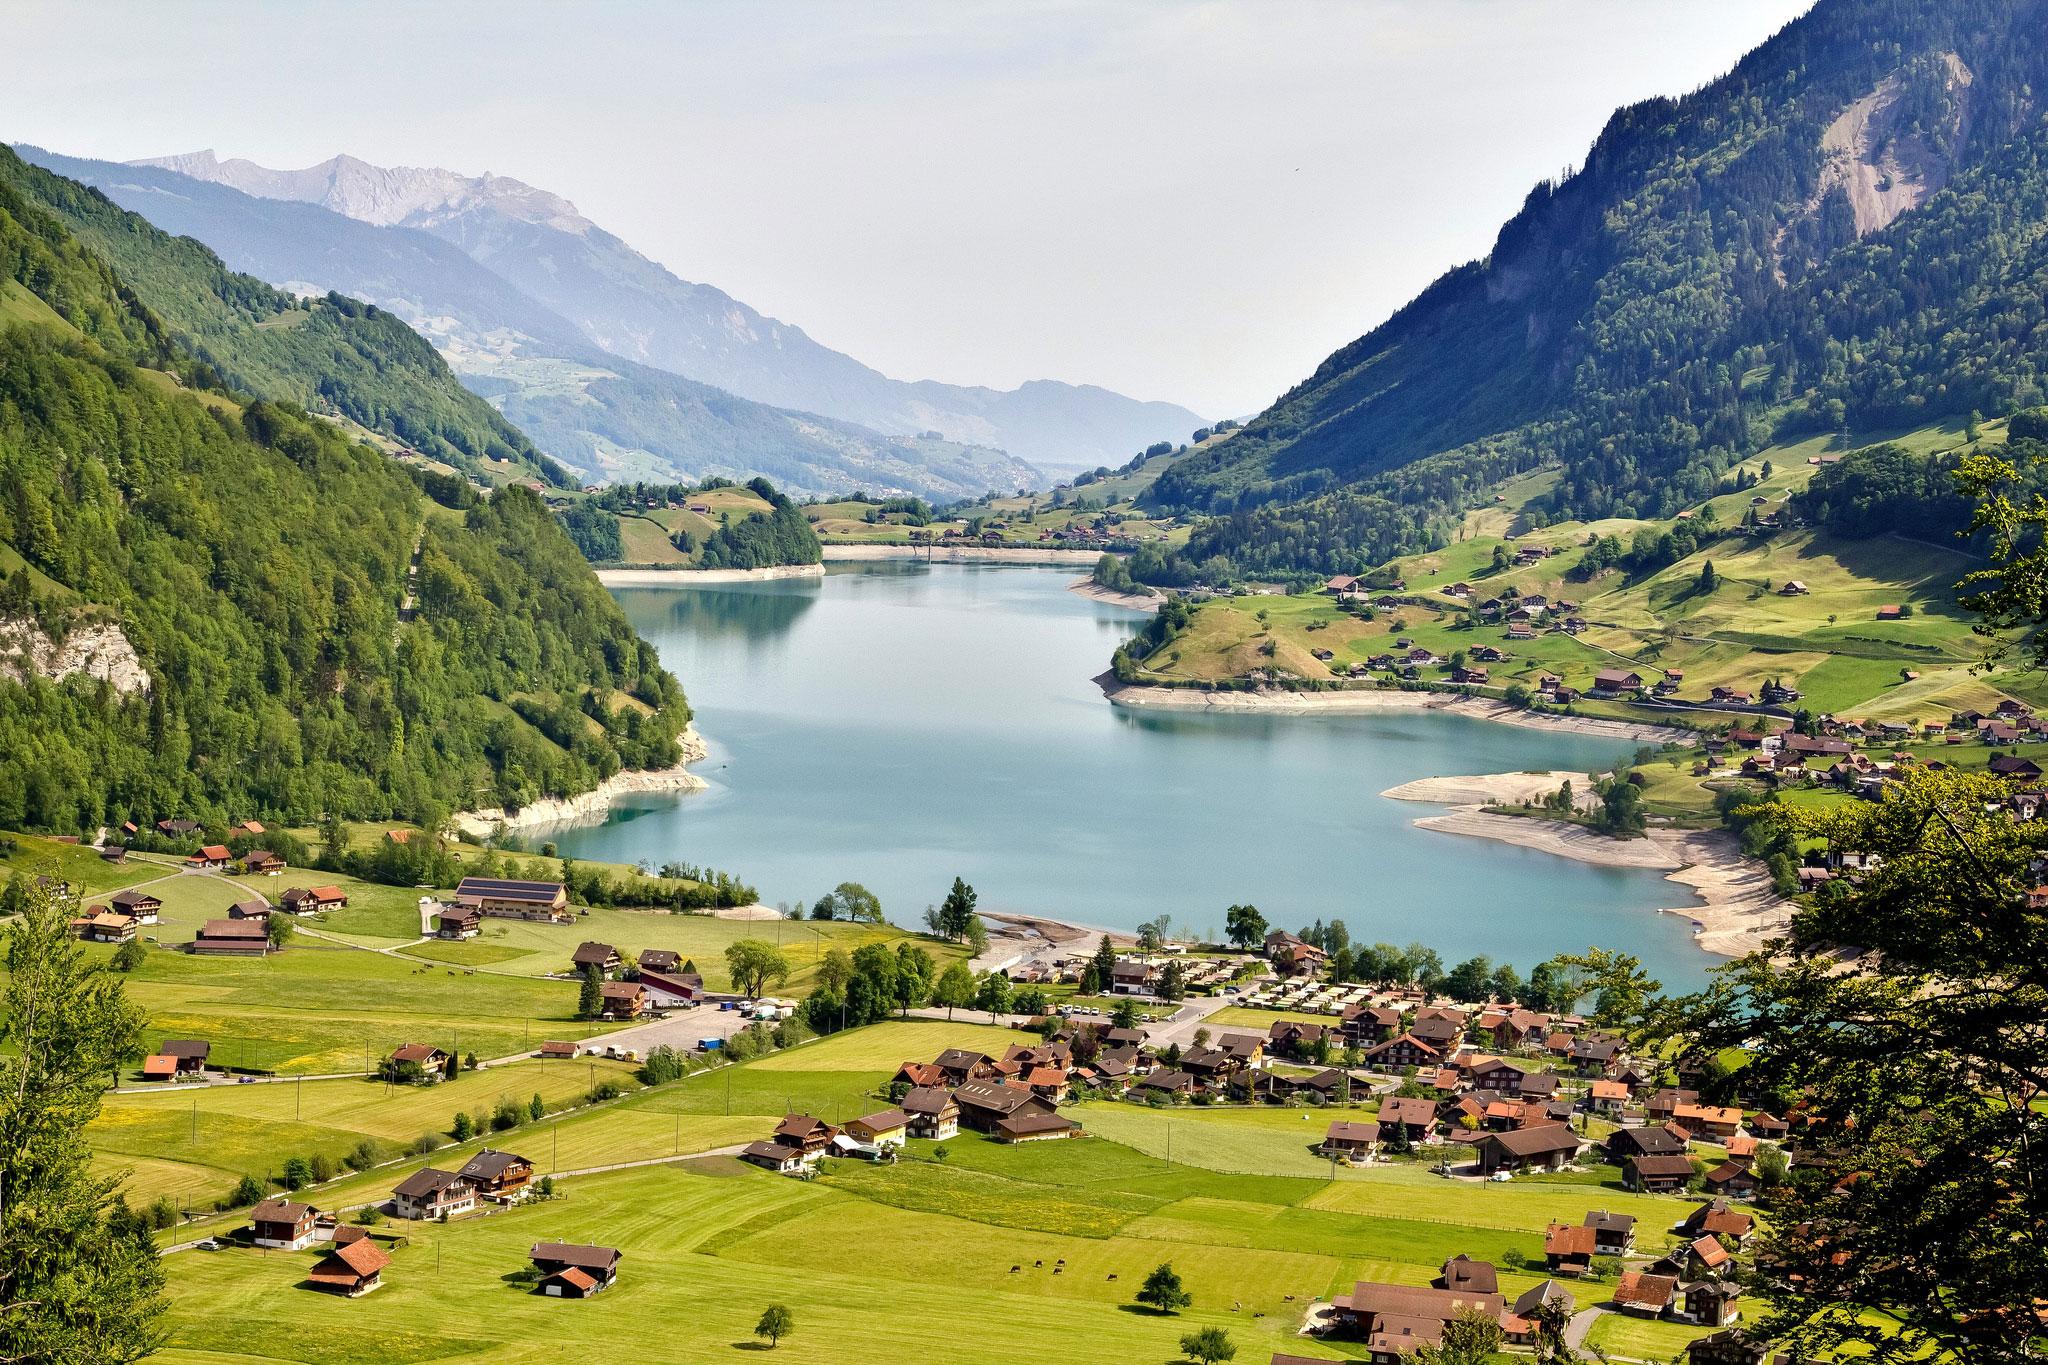 Interlaken hotels - أفضل 10 فنادق في انترلاكن